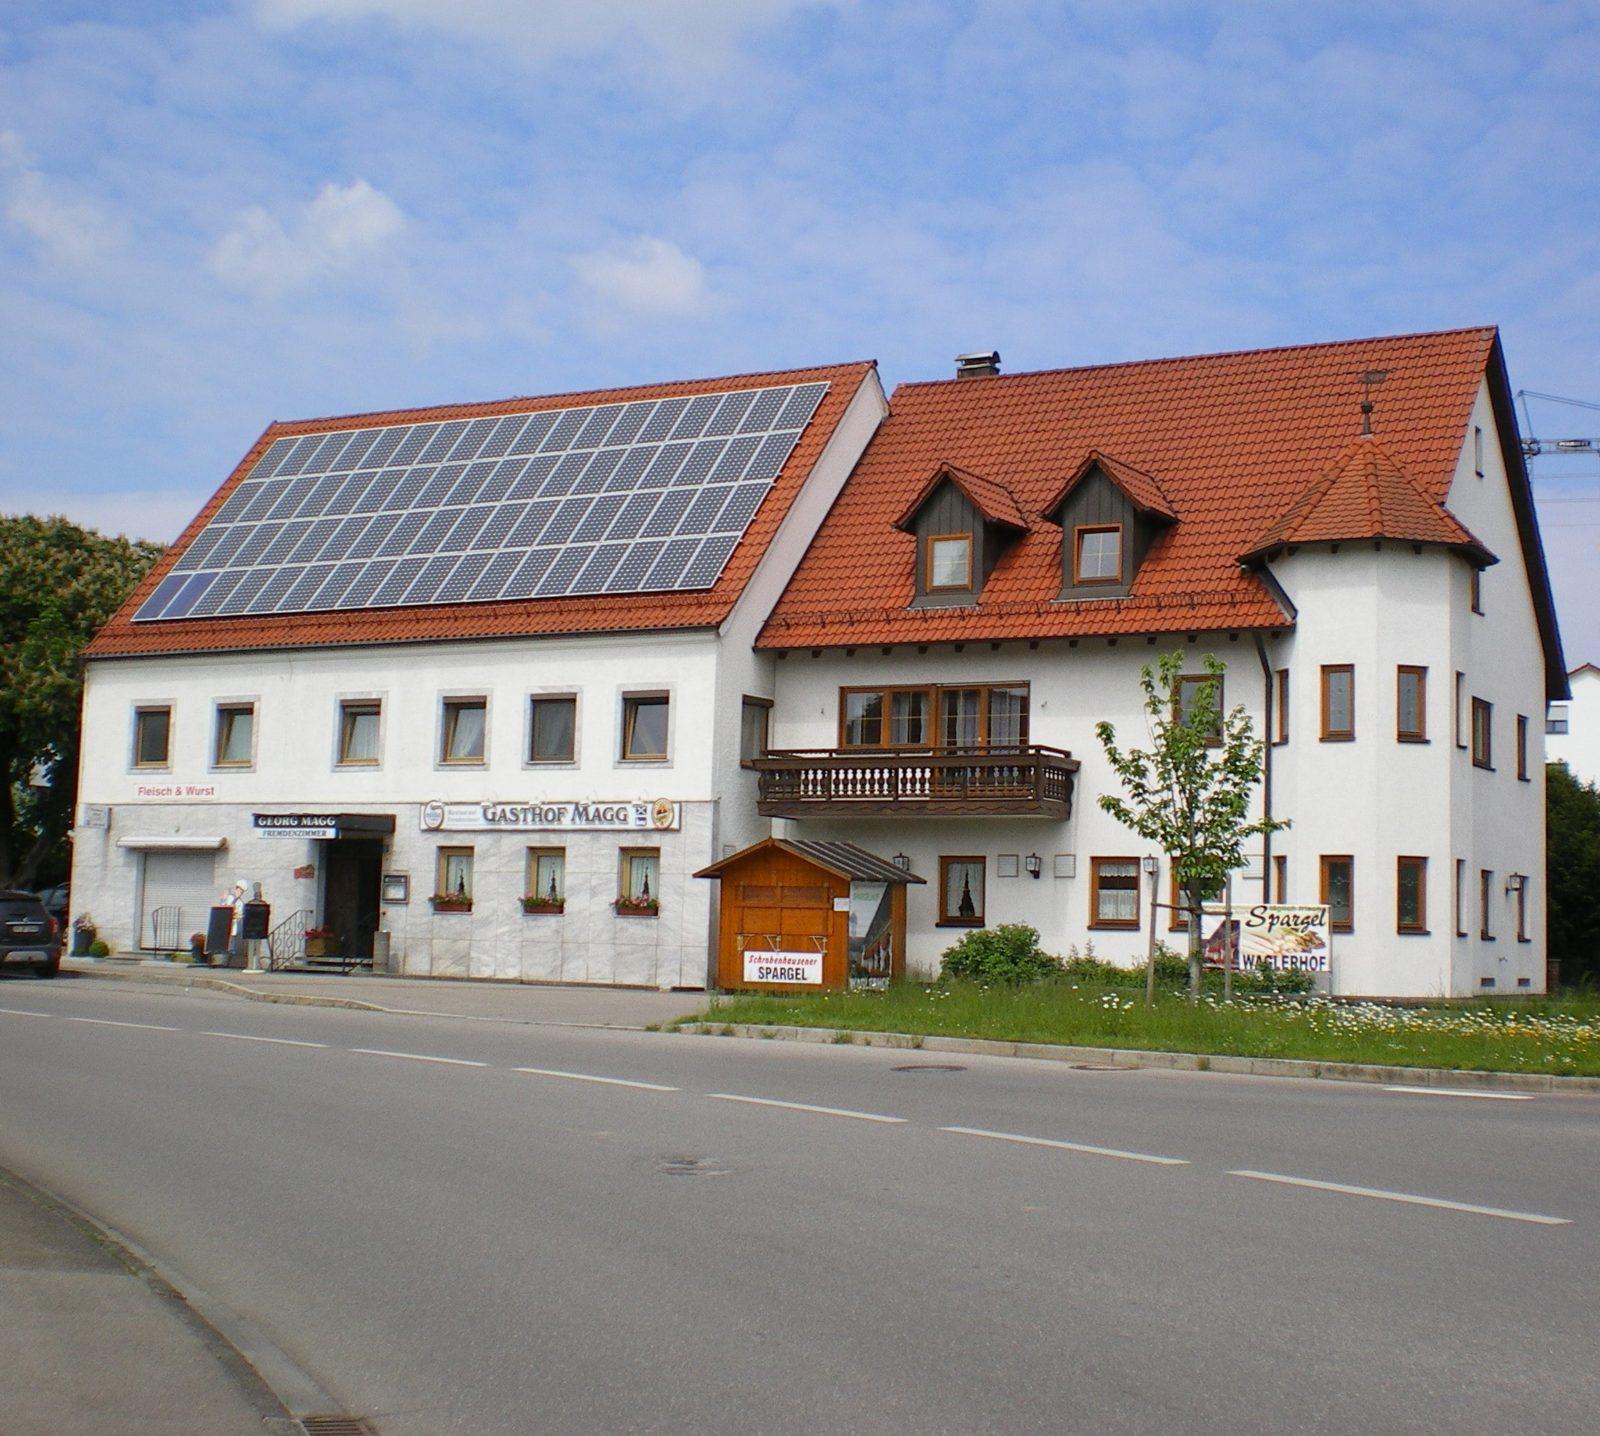 Gasthof Magg